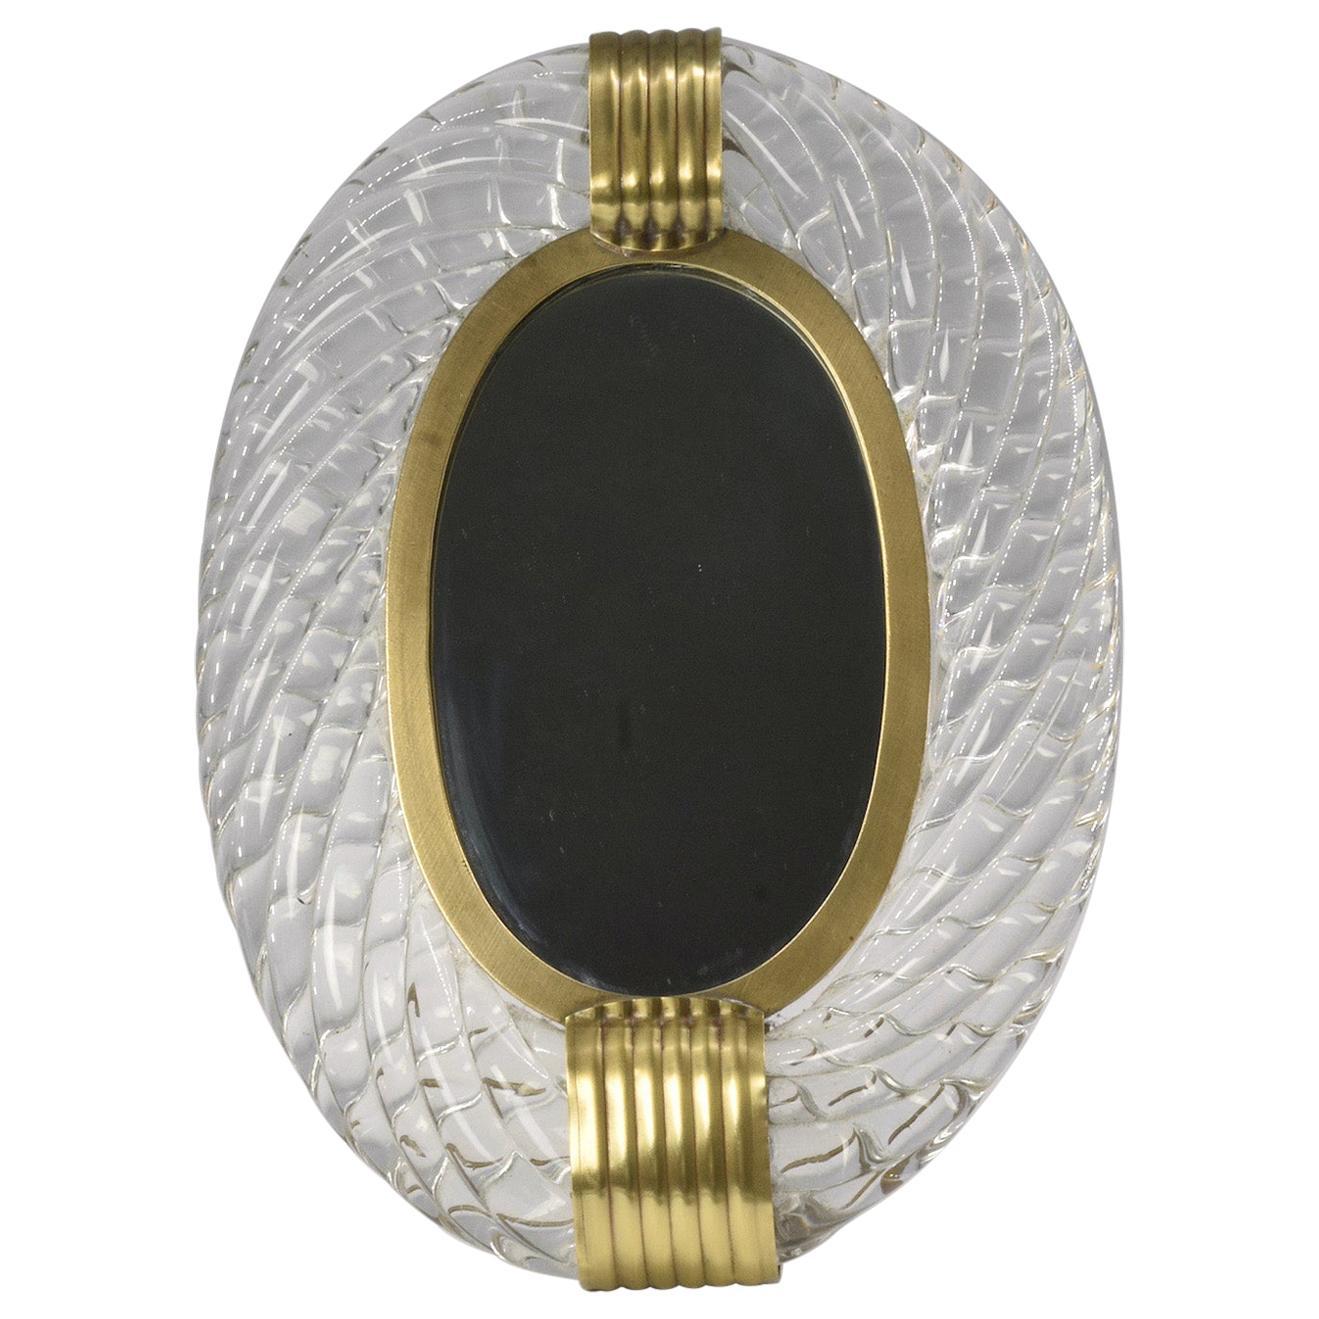 1950s Murano Vanity Mirror or Photo Frame by Carlo Scarpa for Venini